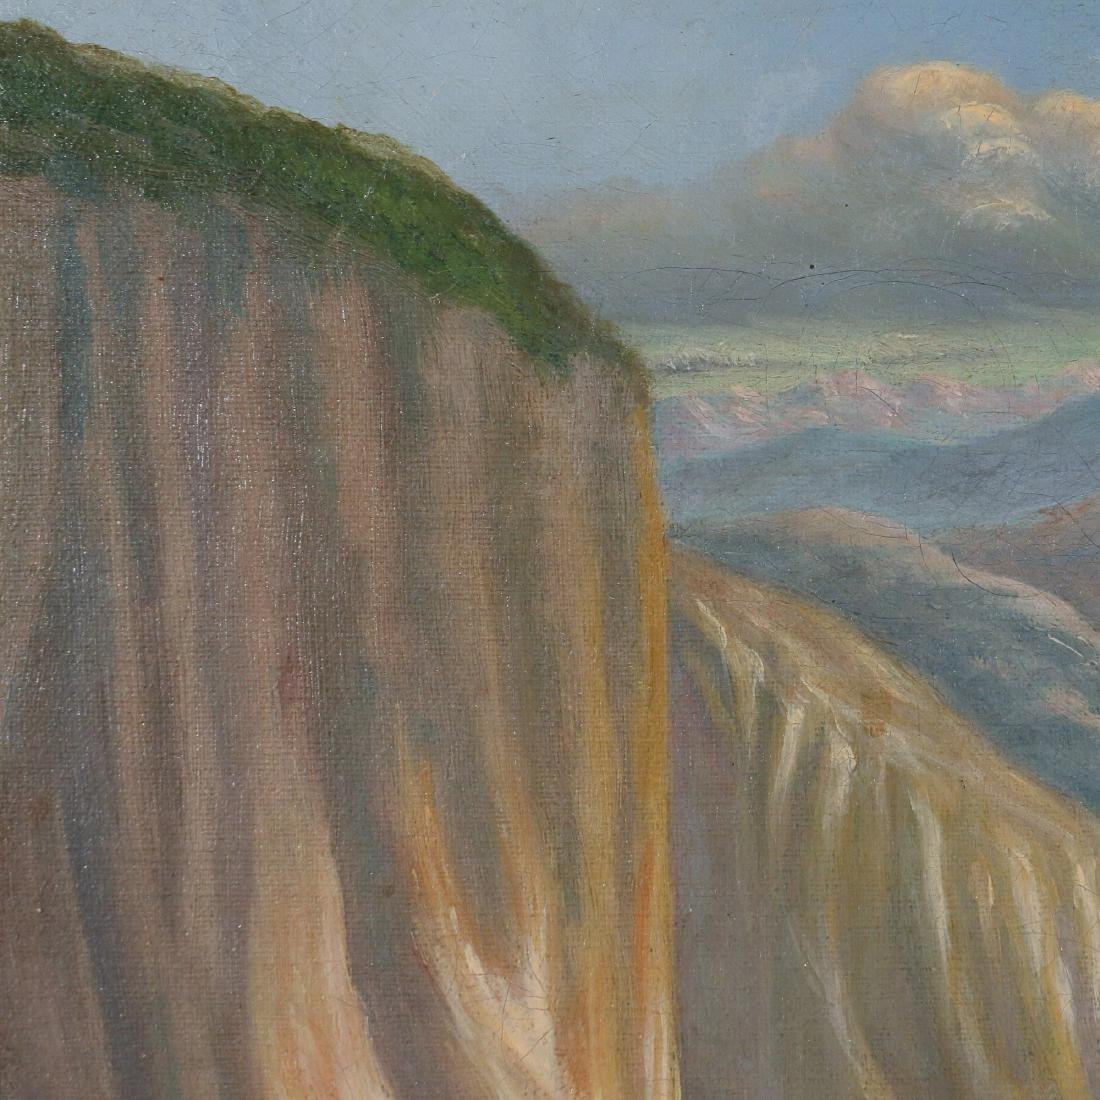 EARLY CALIFORNIA LANDSCAPE, 19th/20th Century - 3